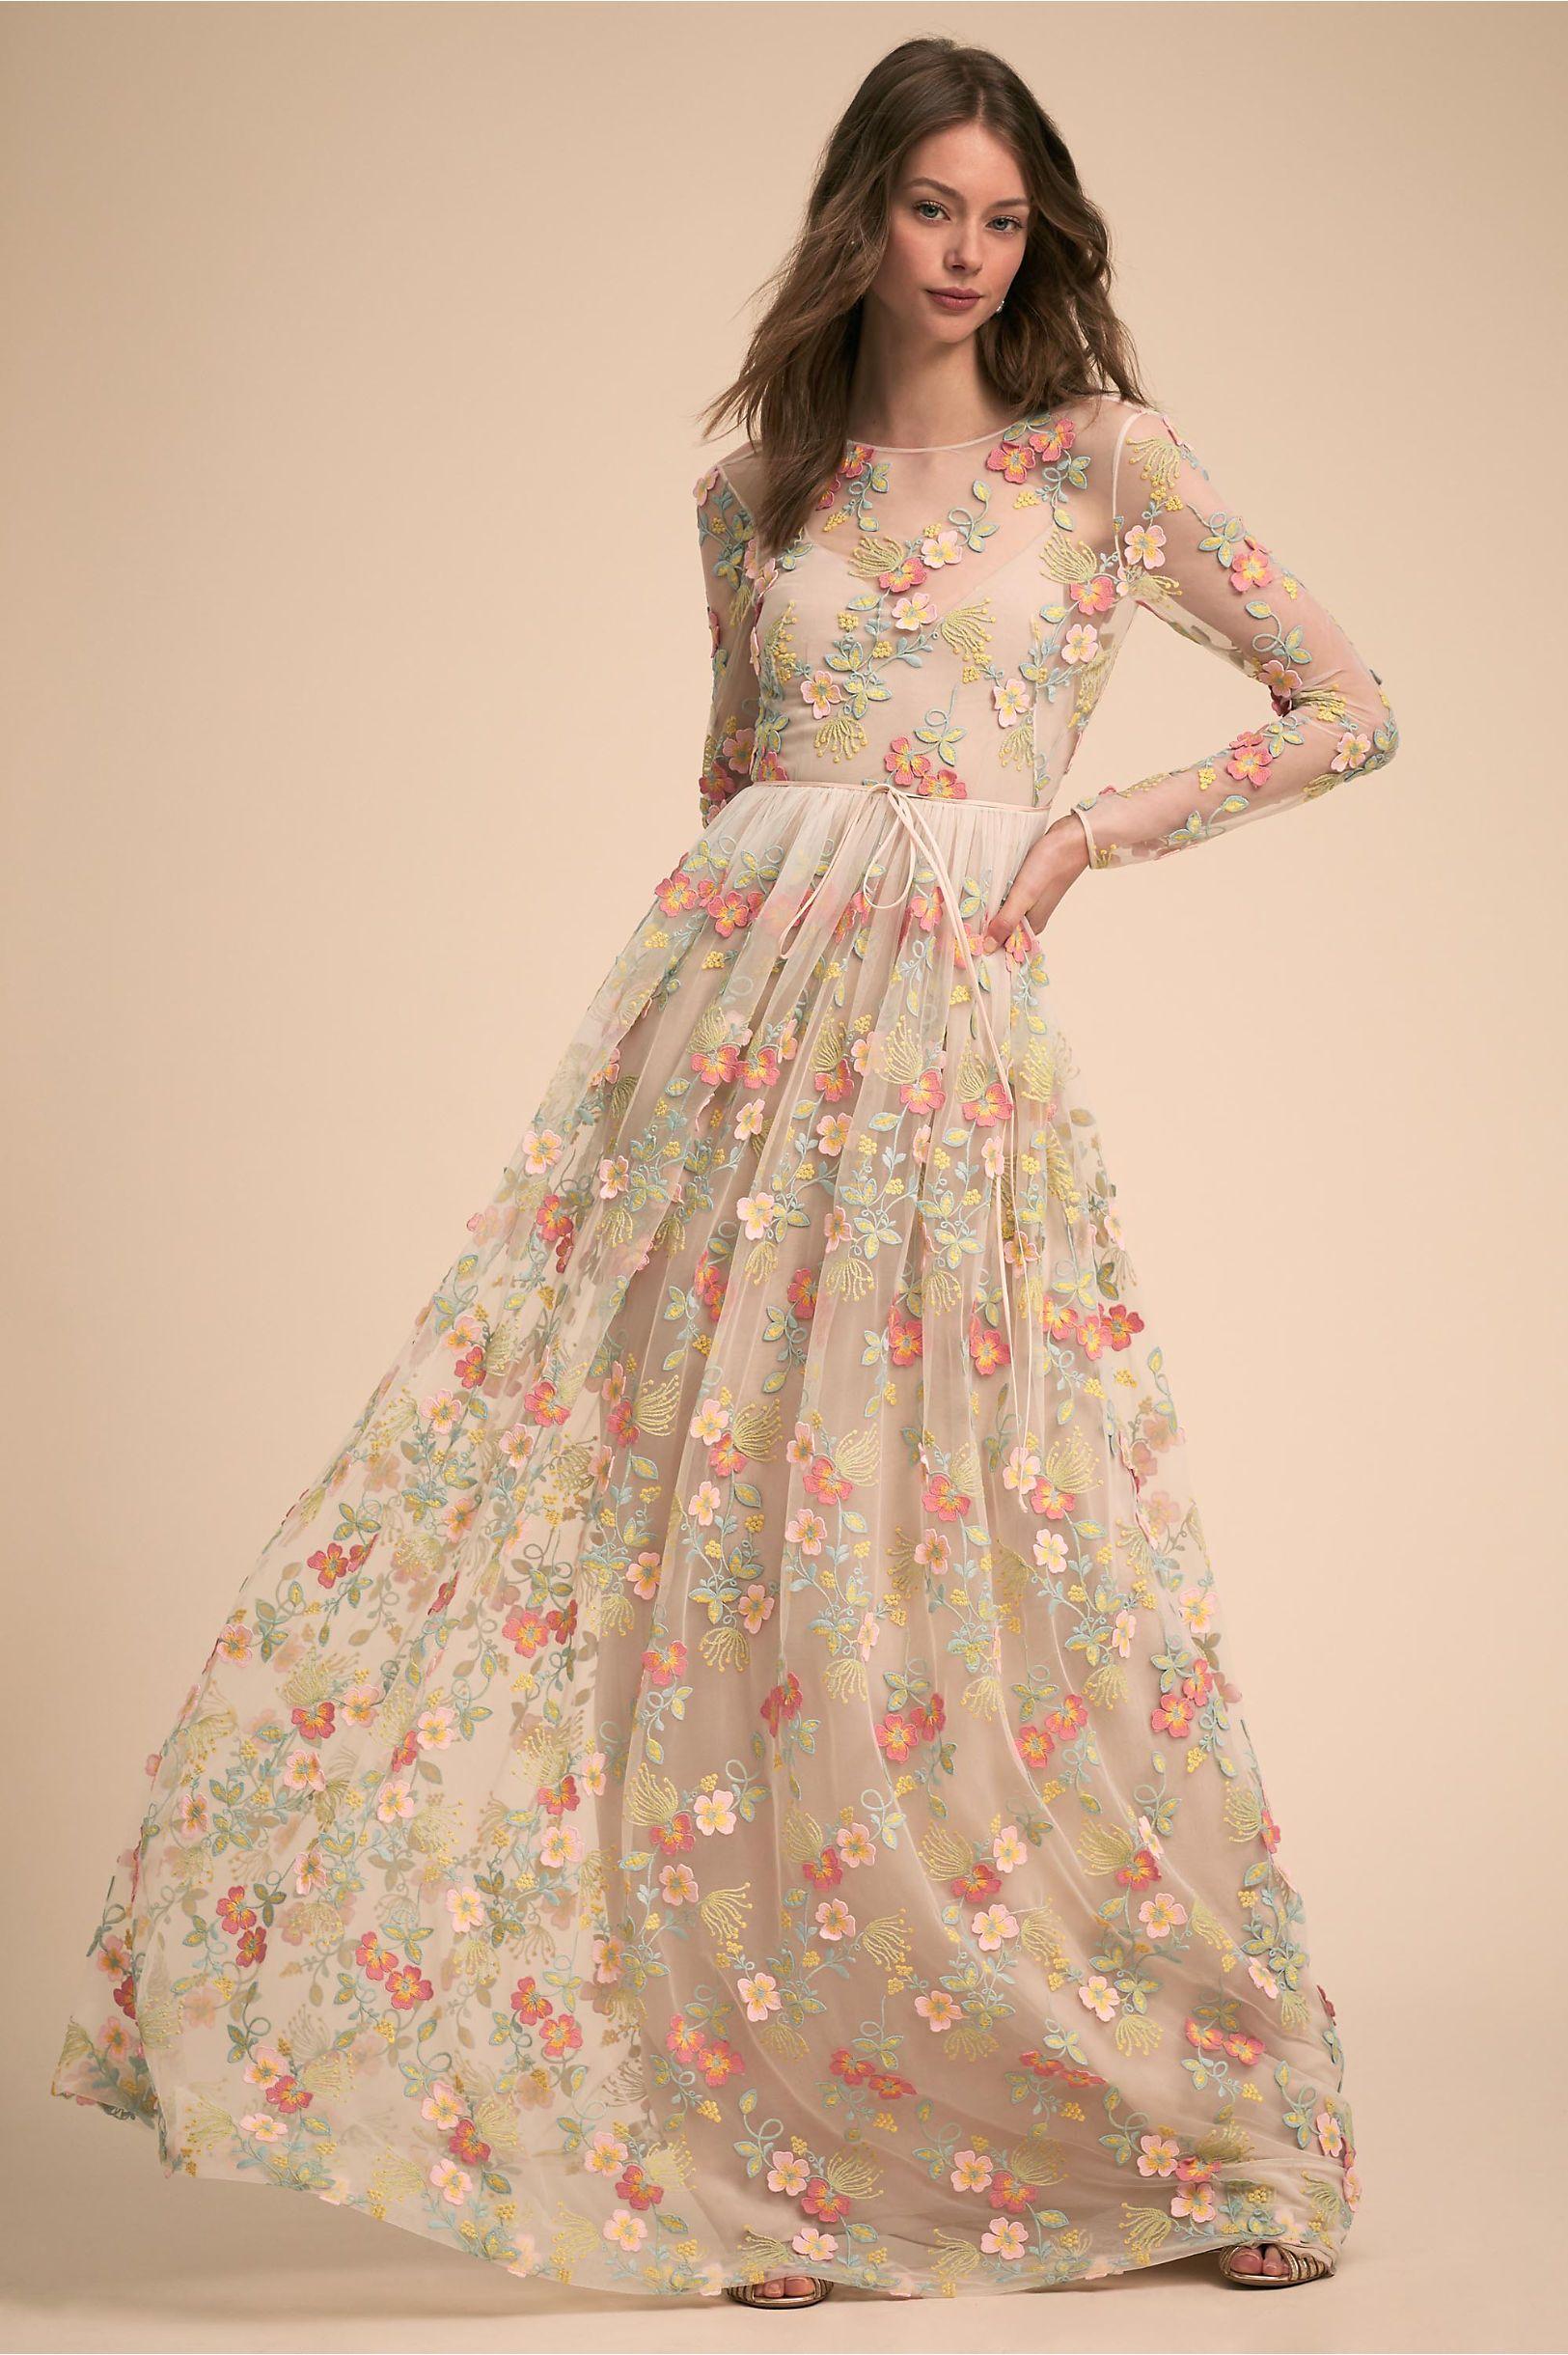 Bhldnus ml monique lhuillier declan dress in floral combo products